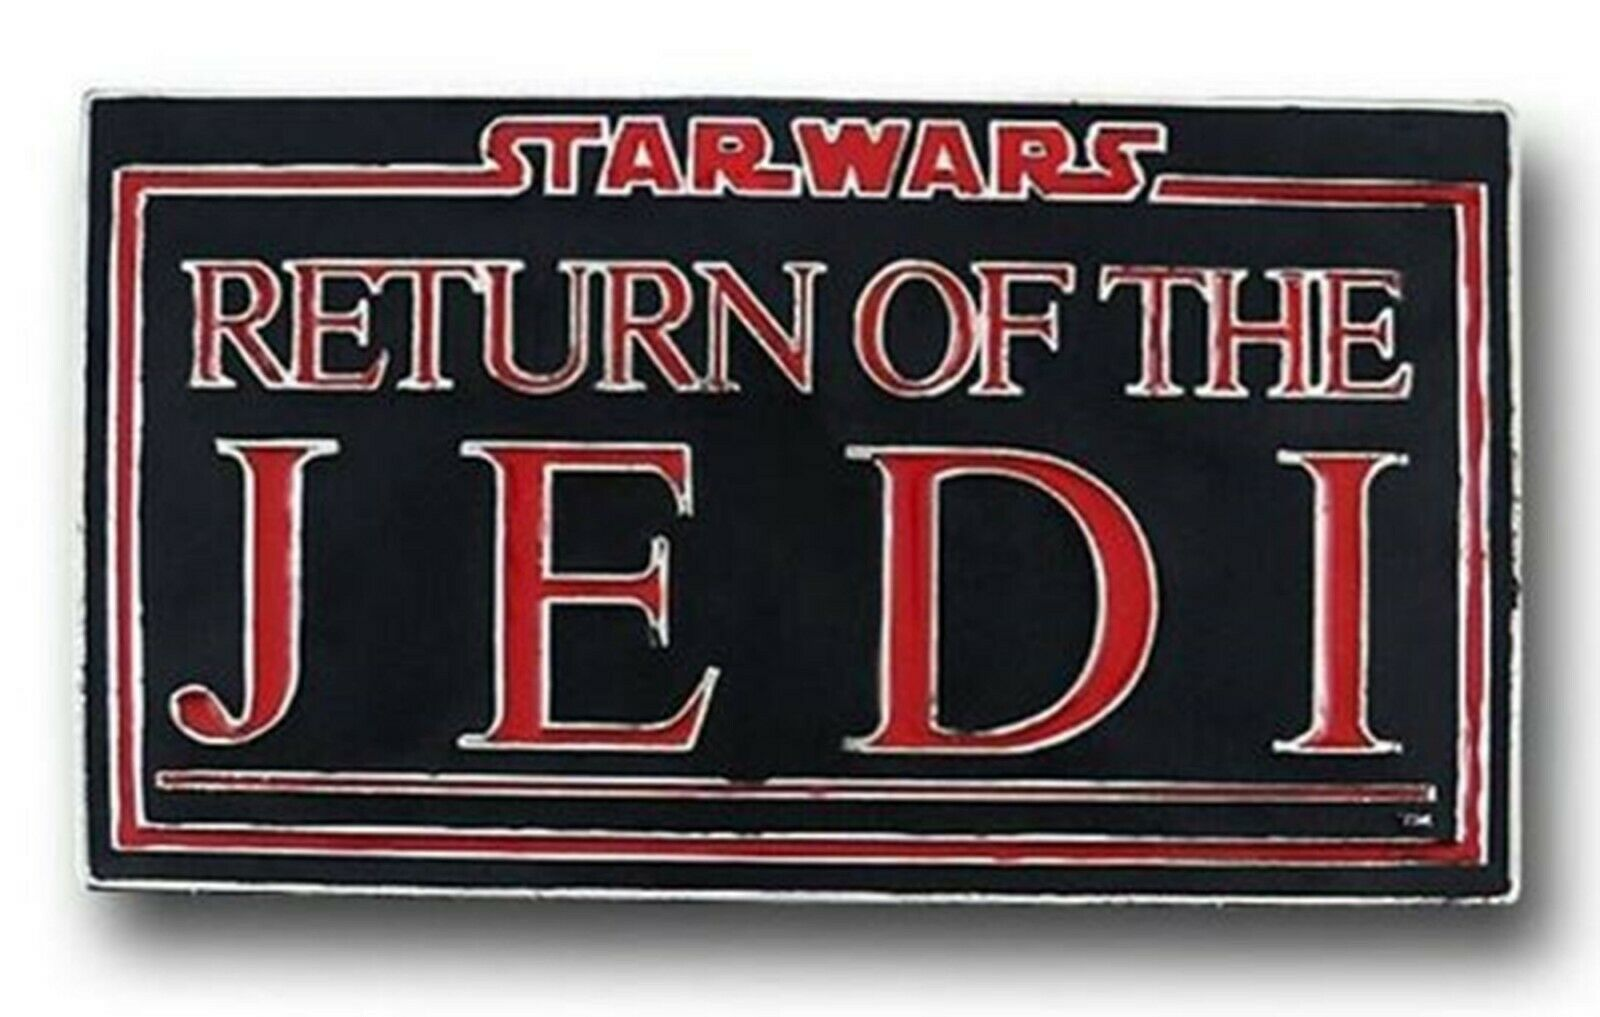 Star Wars George Lucas Belt Buckle Return of the Jedi Text Original Cosplay New